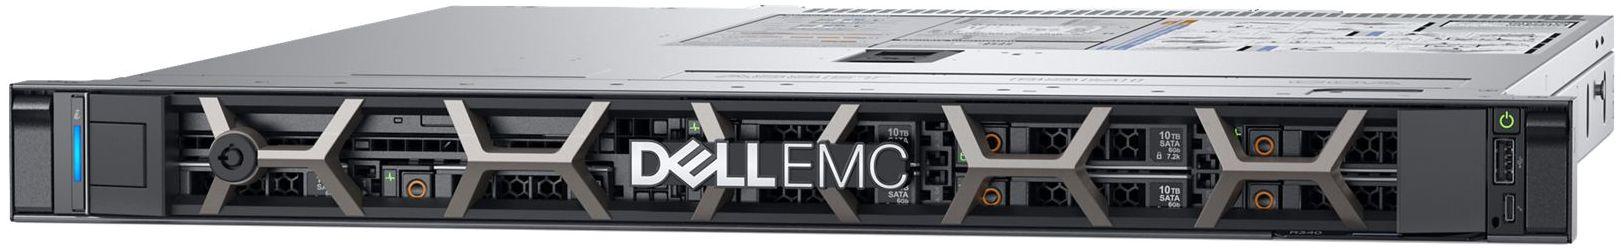 Dell EMC PowerEdge R340